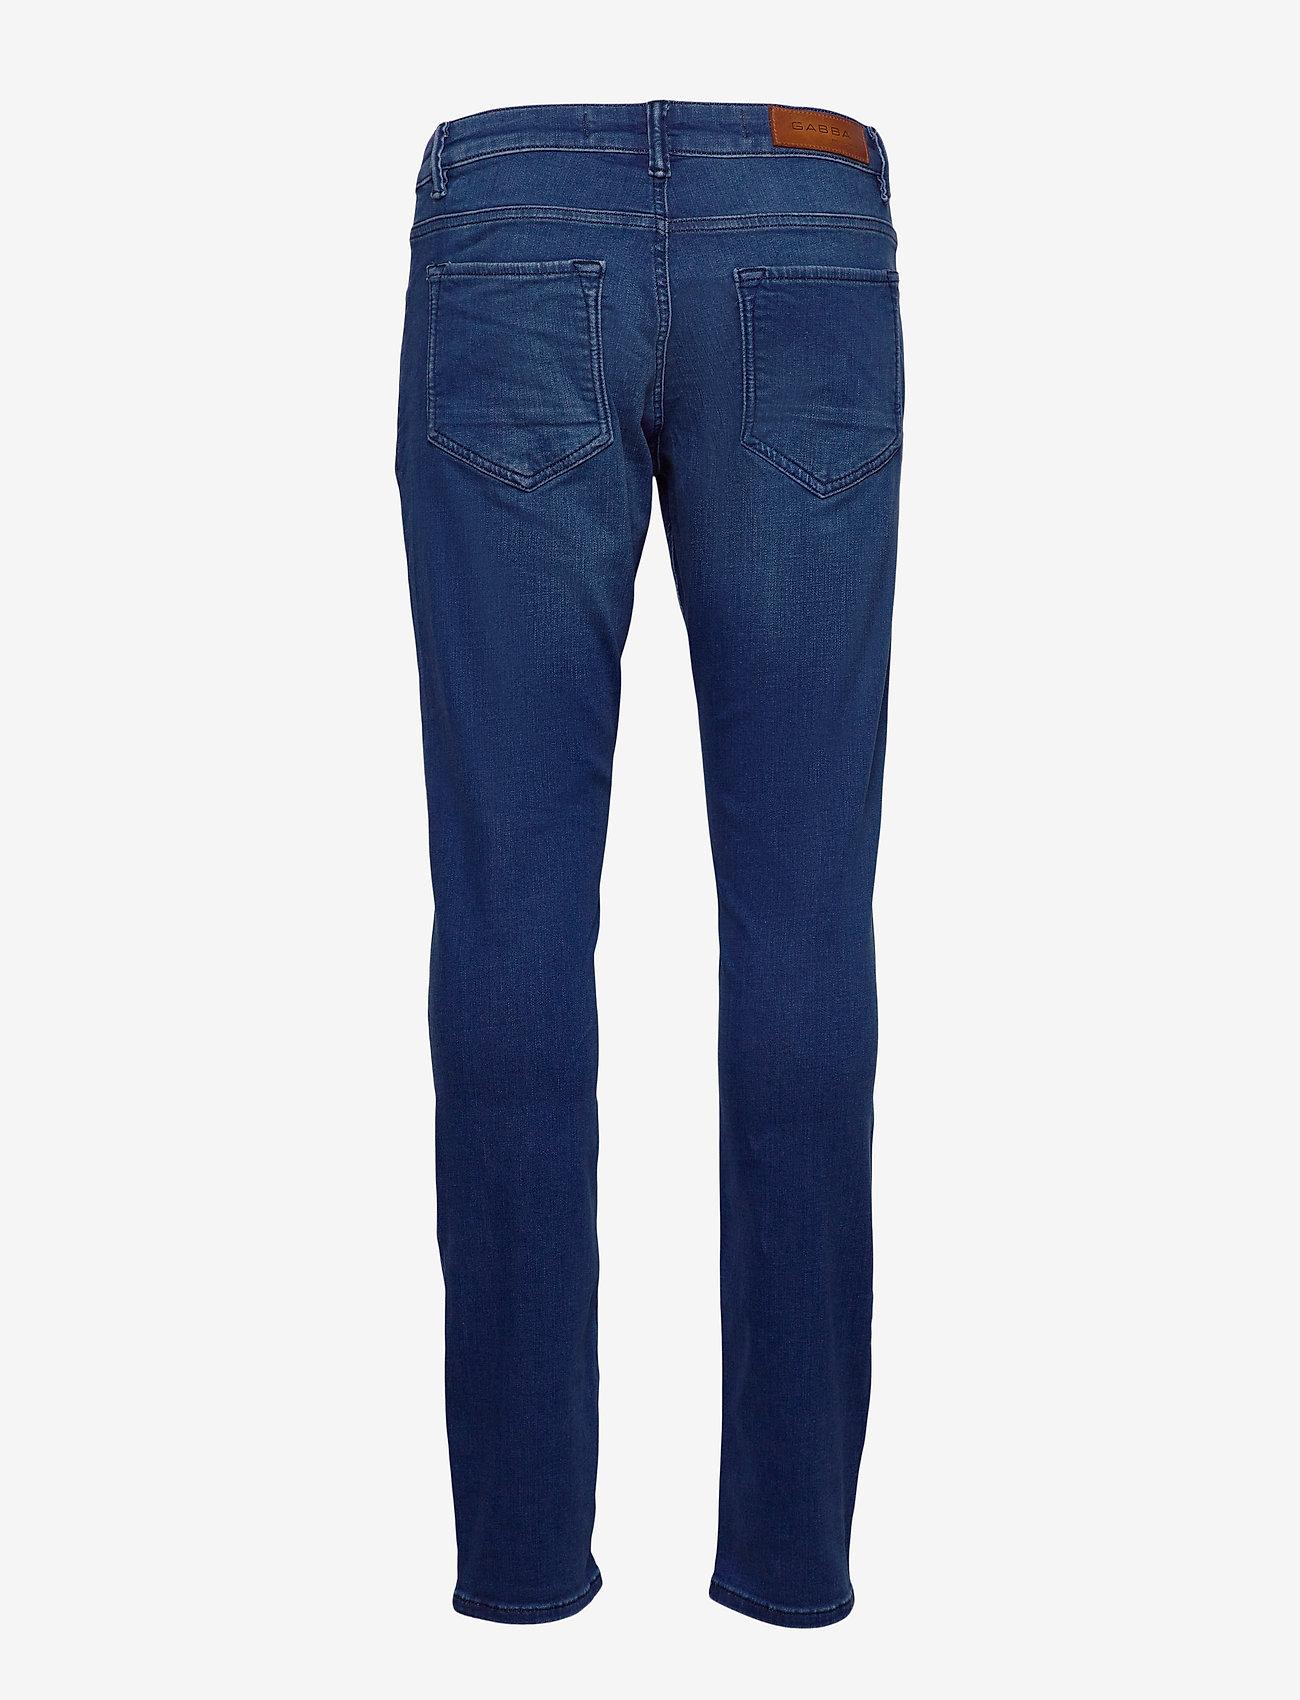 Gabba - Jones K3413 Lt - slim jeans - rs1271 - 1